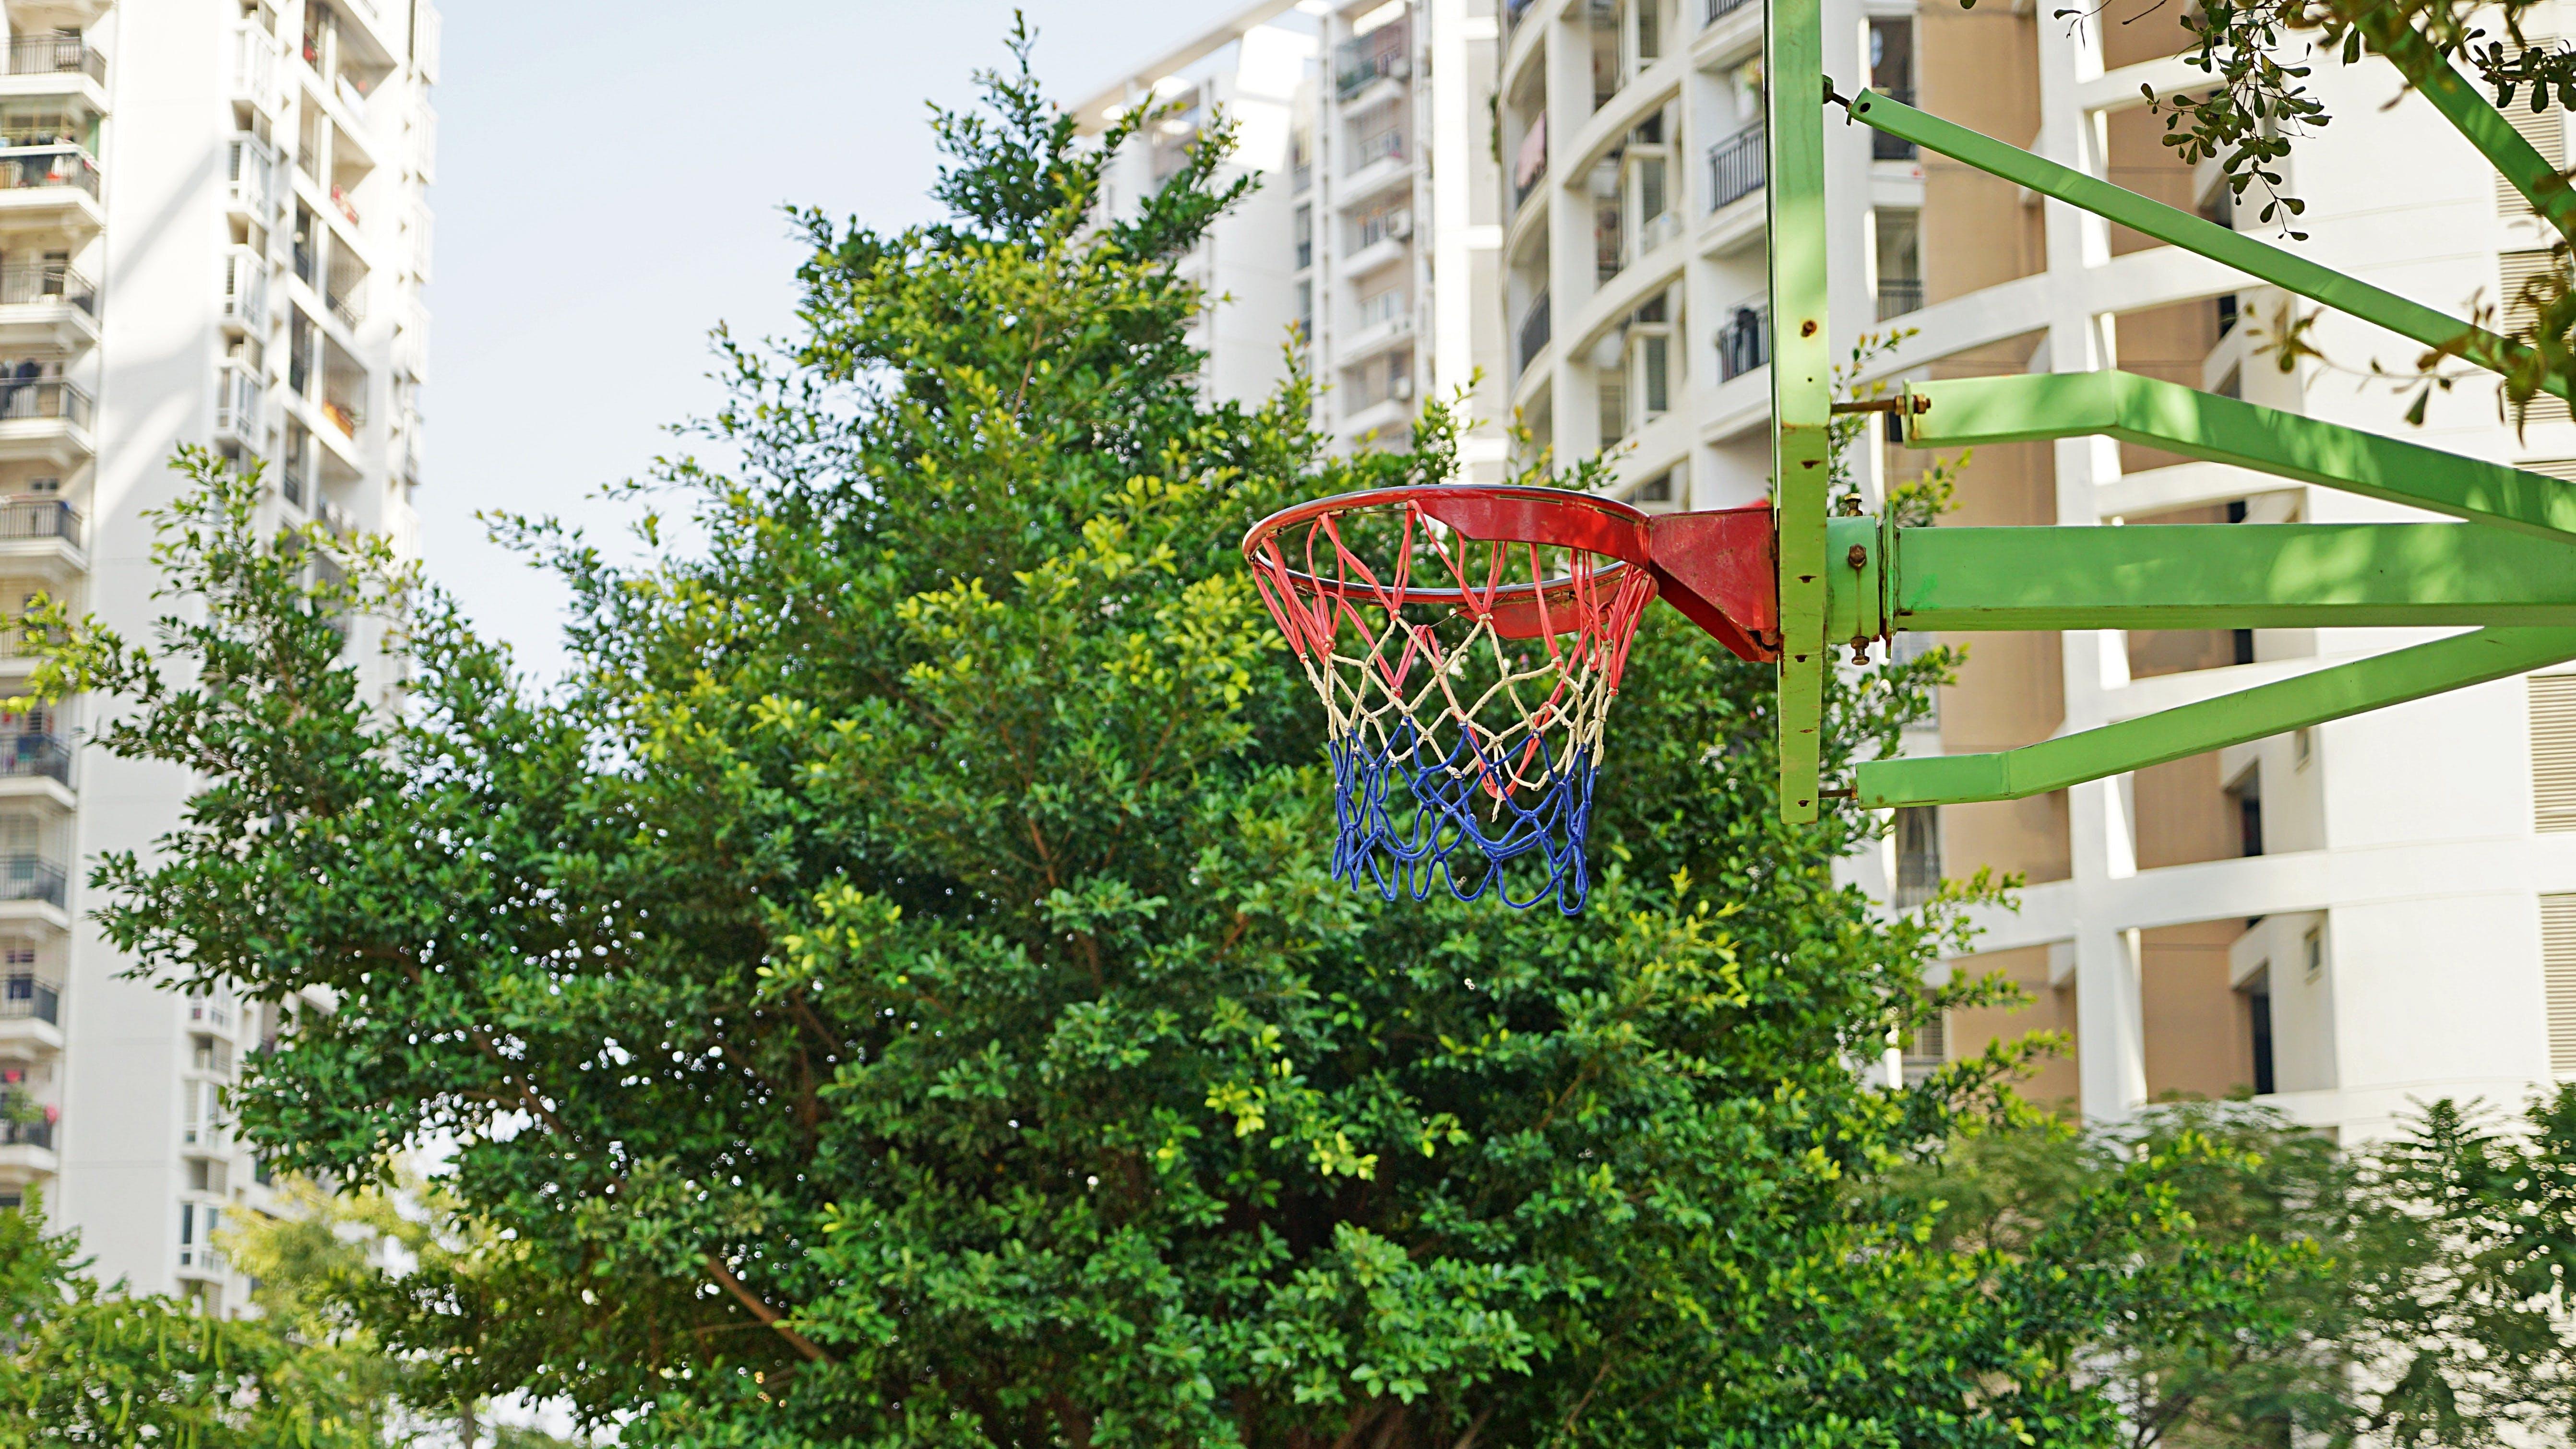 Free stock photo of sunshine, spring, green, basketball